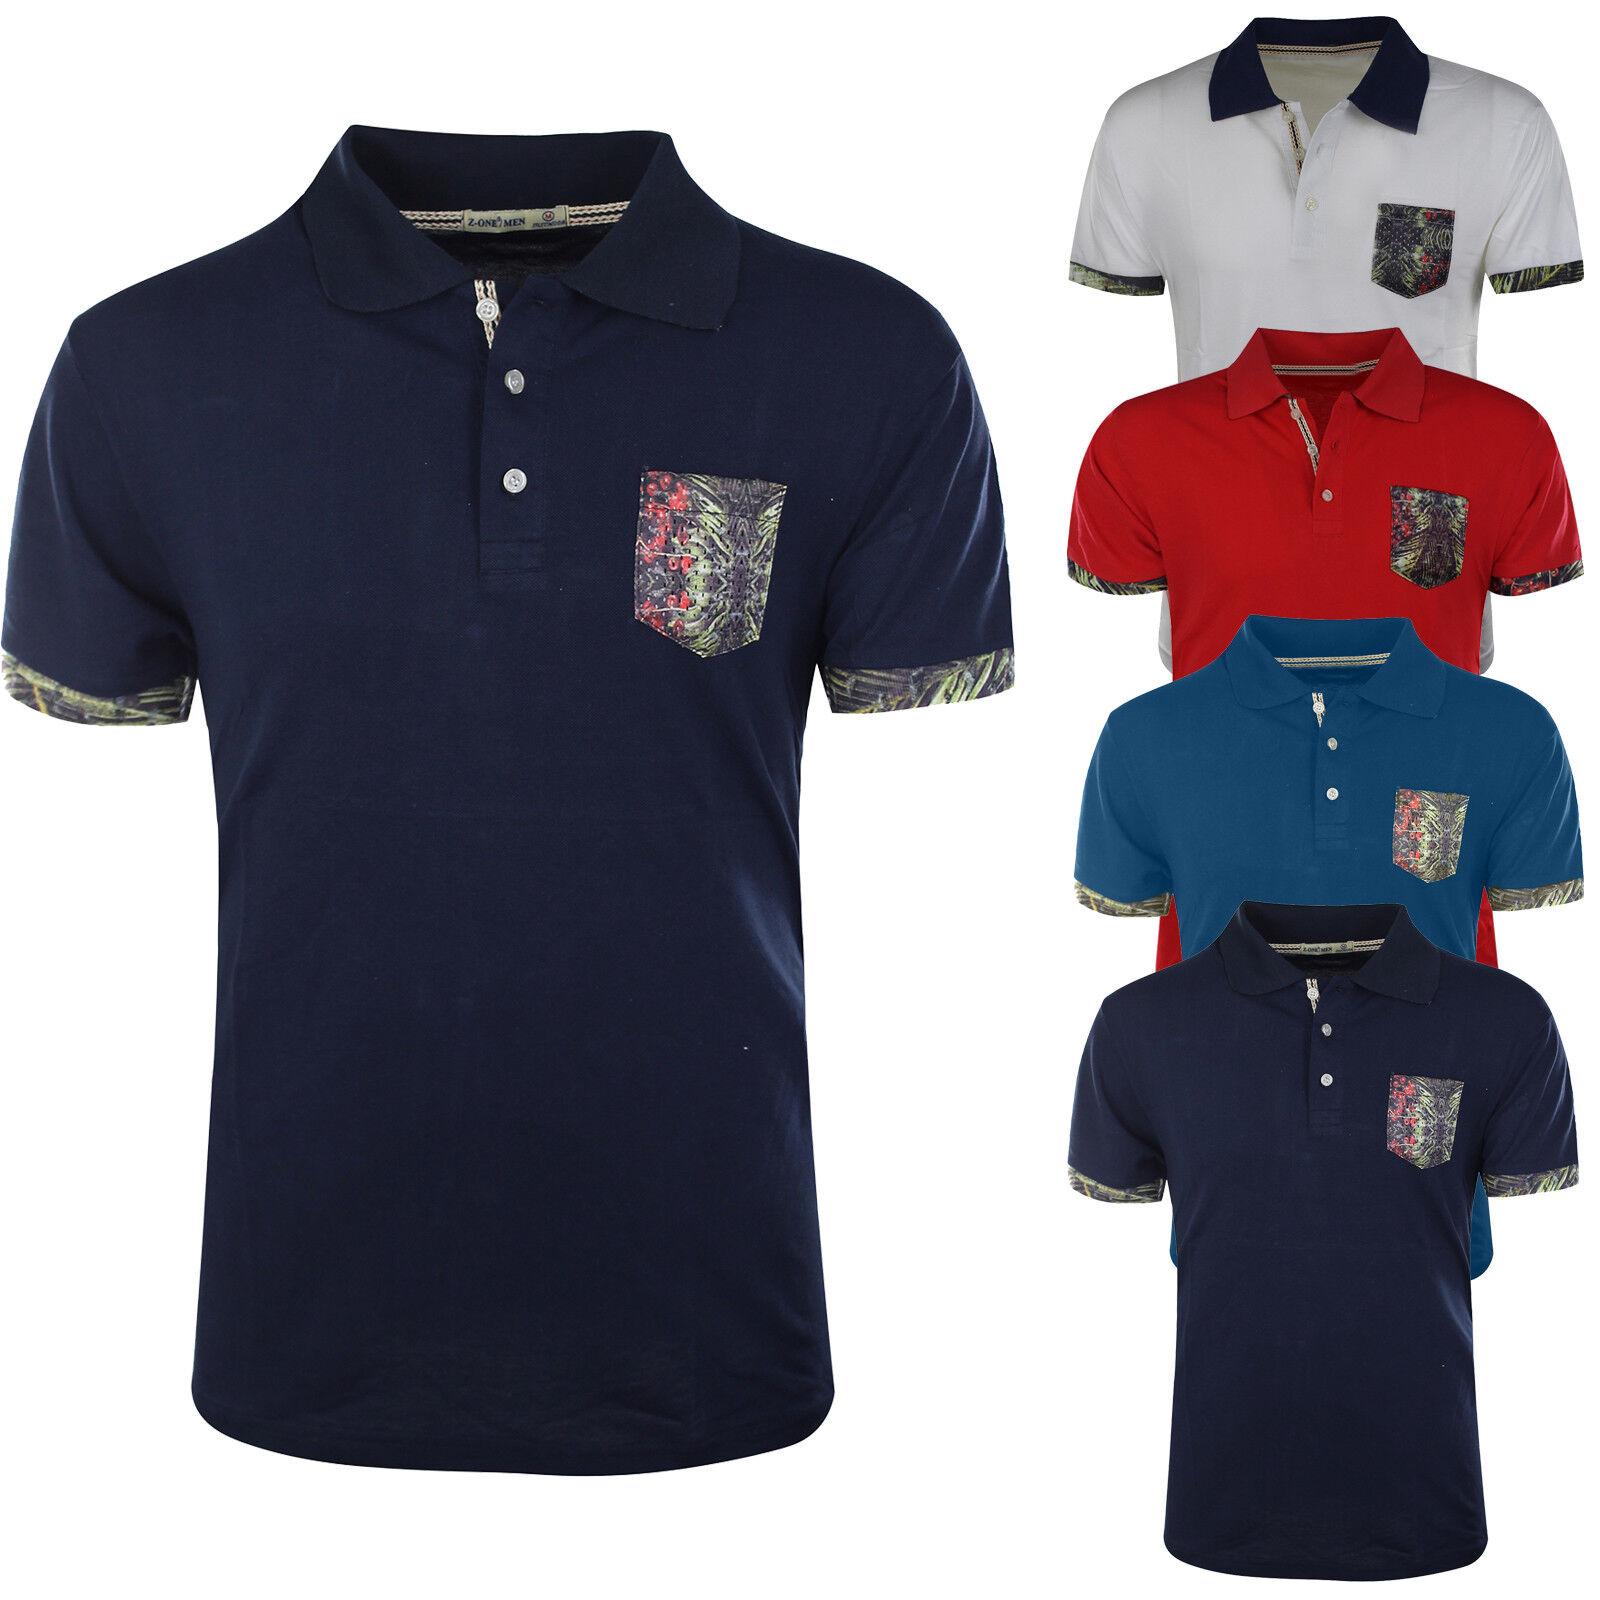 3b4a657f52a Polo Hombre Bolsillo Algodón Mitad Manga Corta Camiseta Slim Fit ...